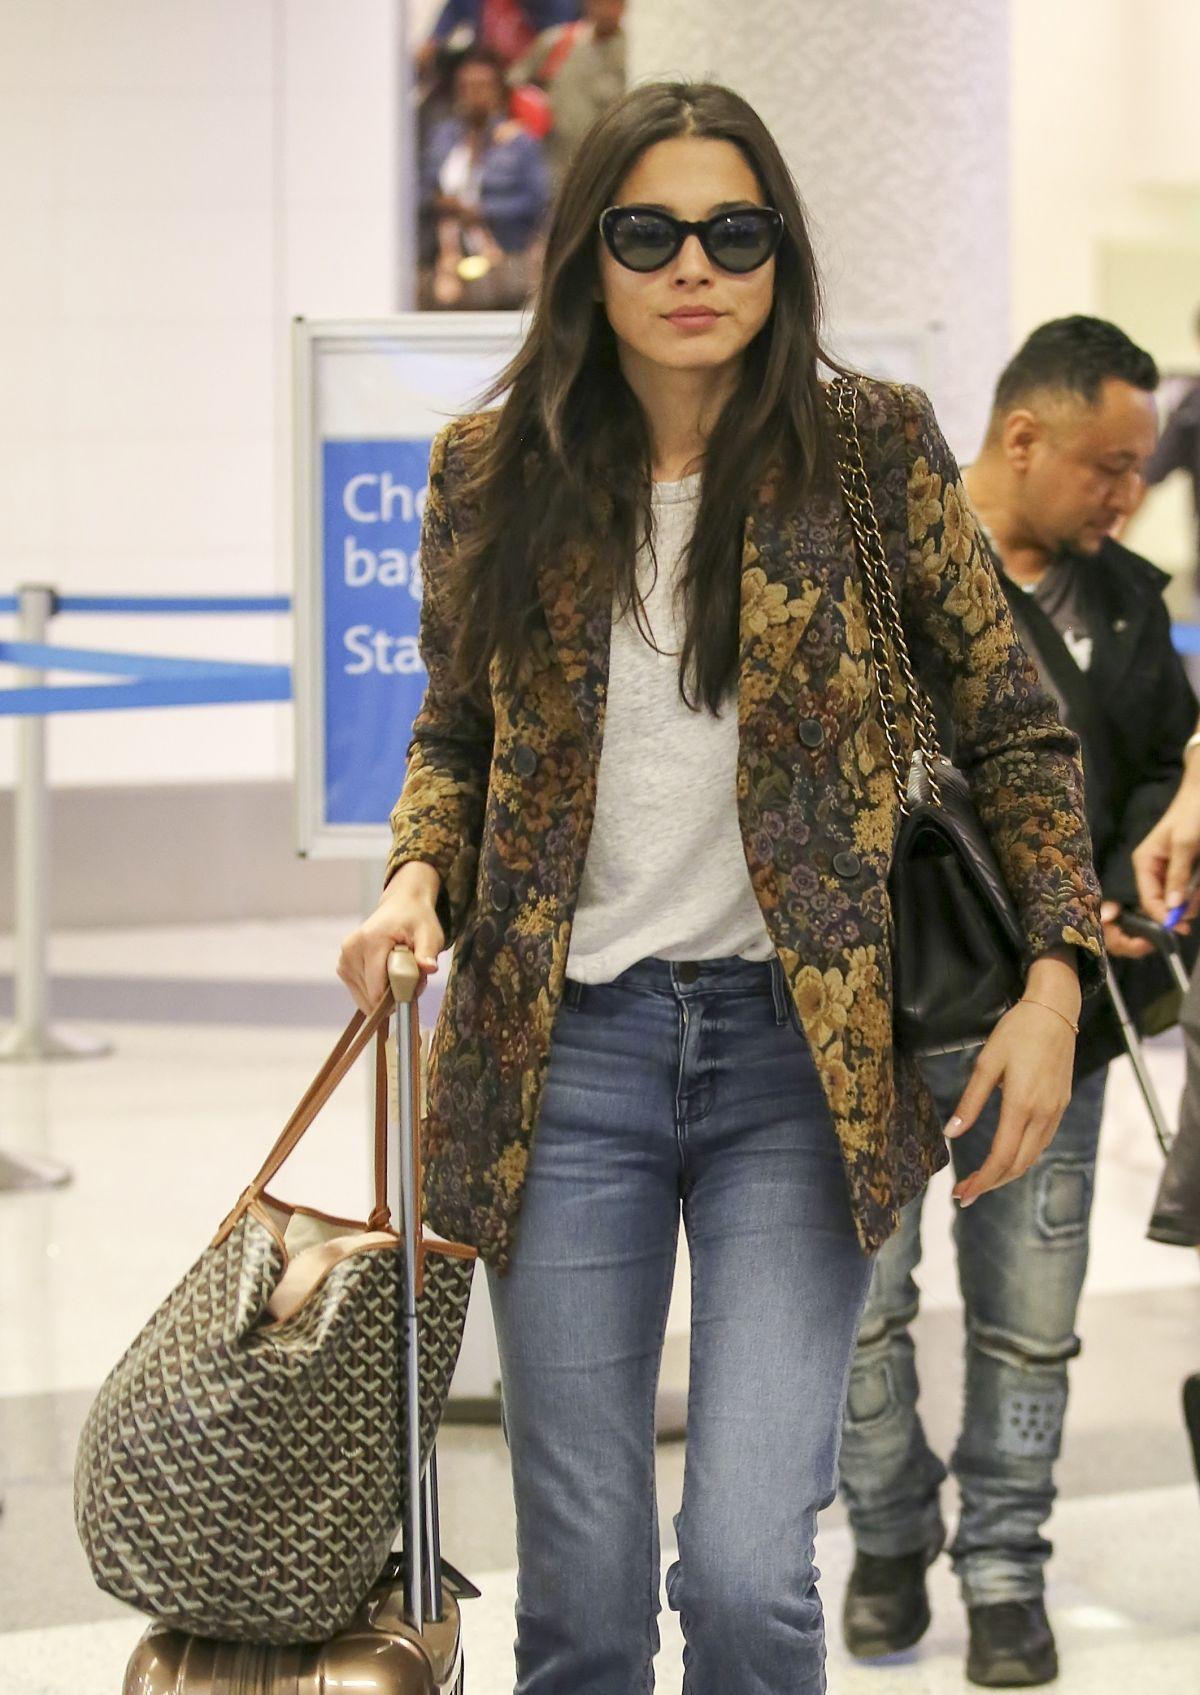 JESSICA GOMES at Los Angeles International Airport 09/15/2017